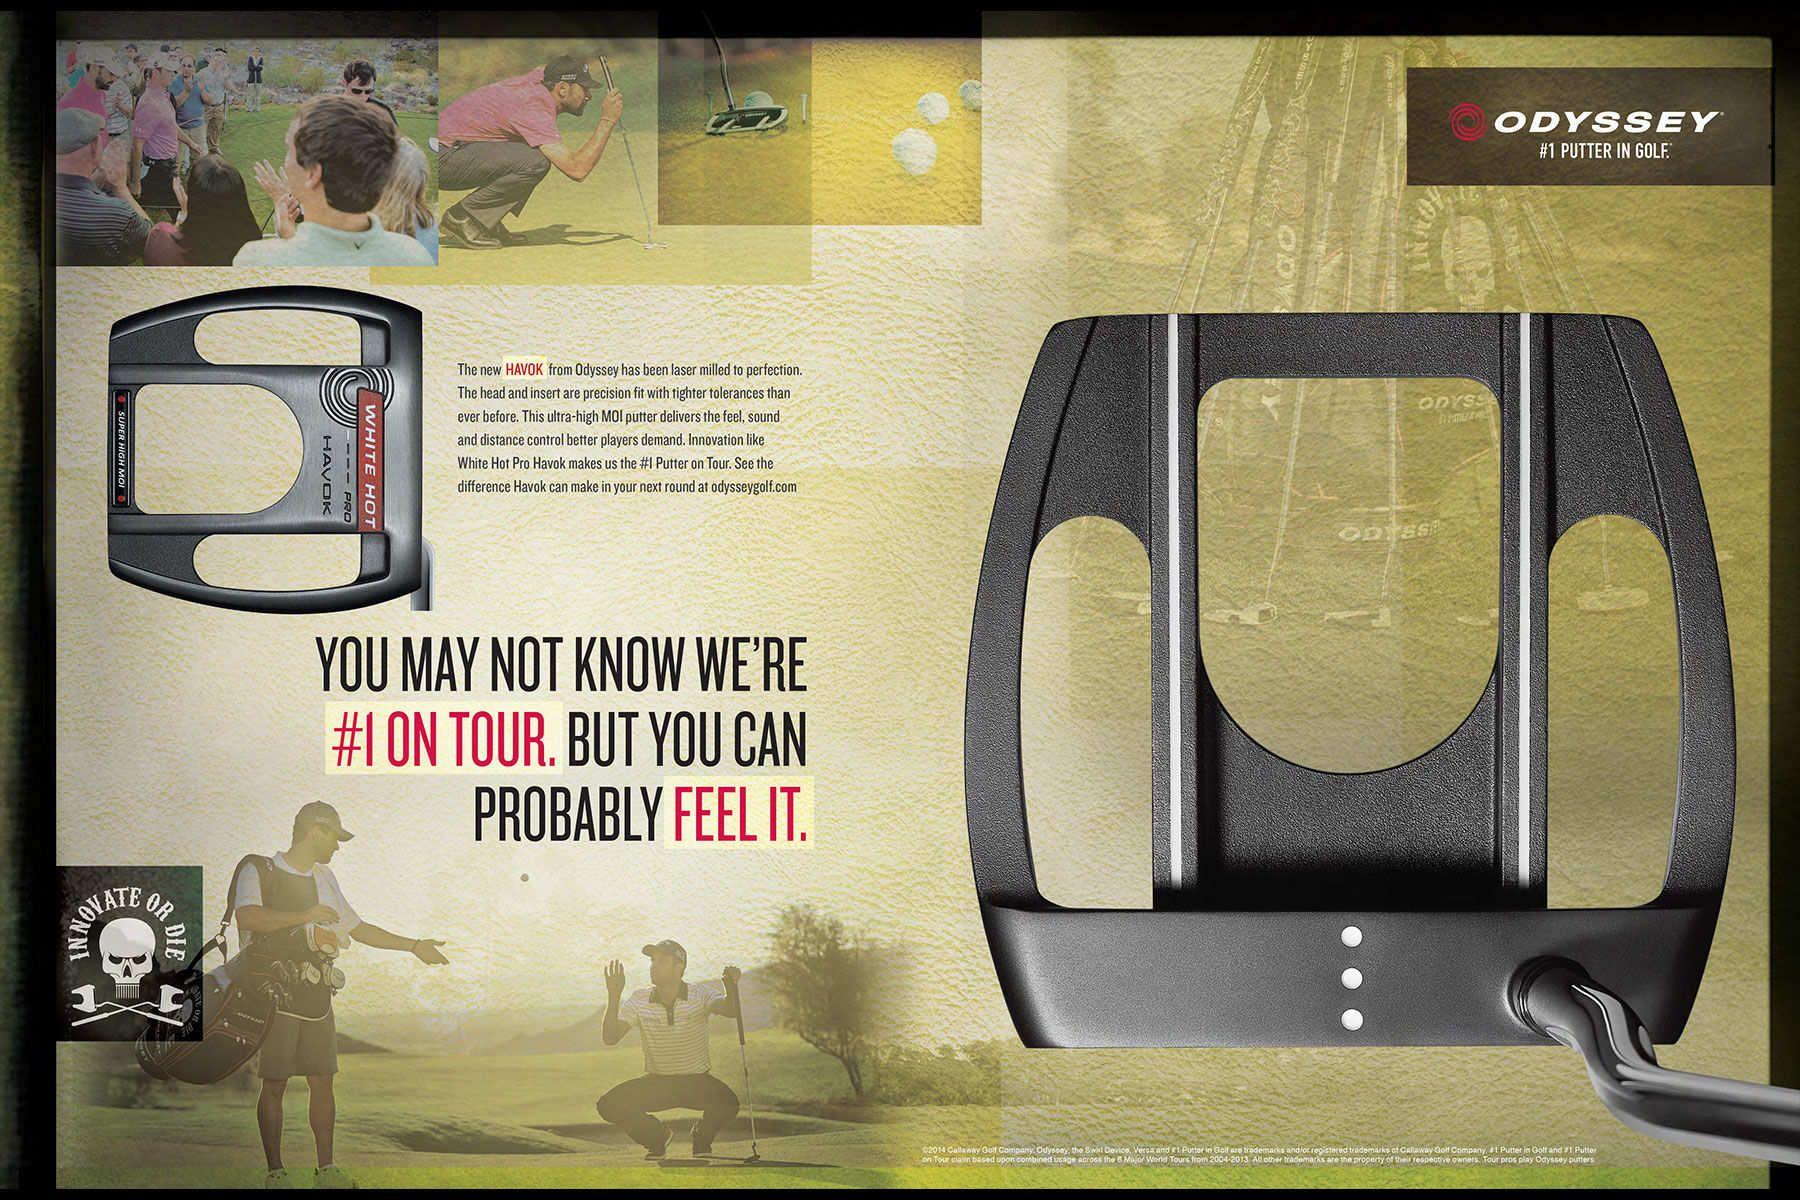 Odyssey Putter / Callaway Golf 2014 Ad Campaign